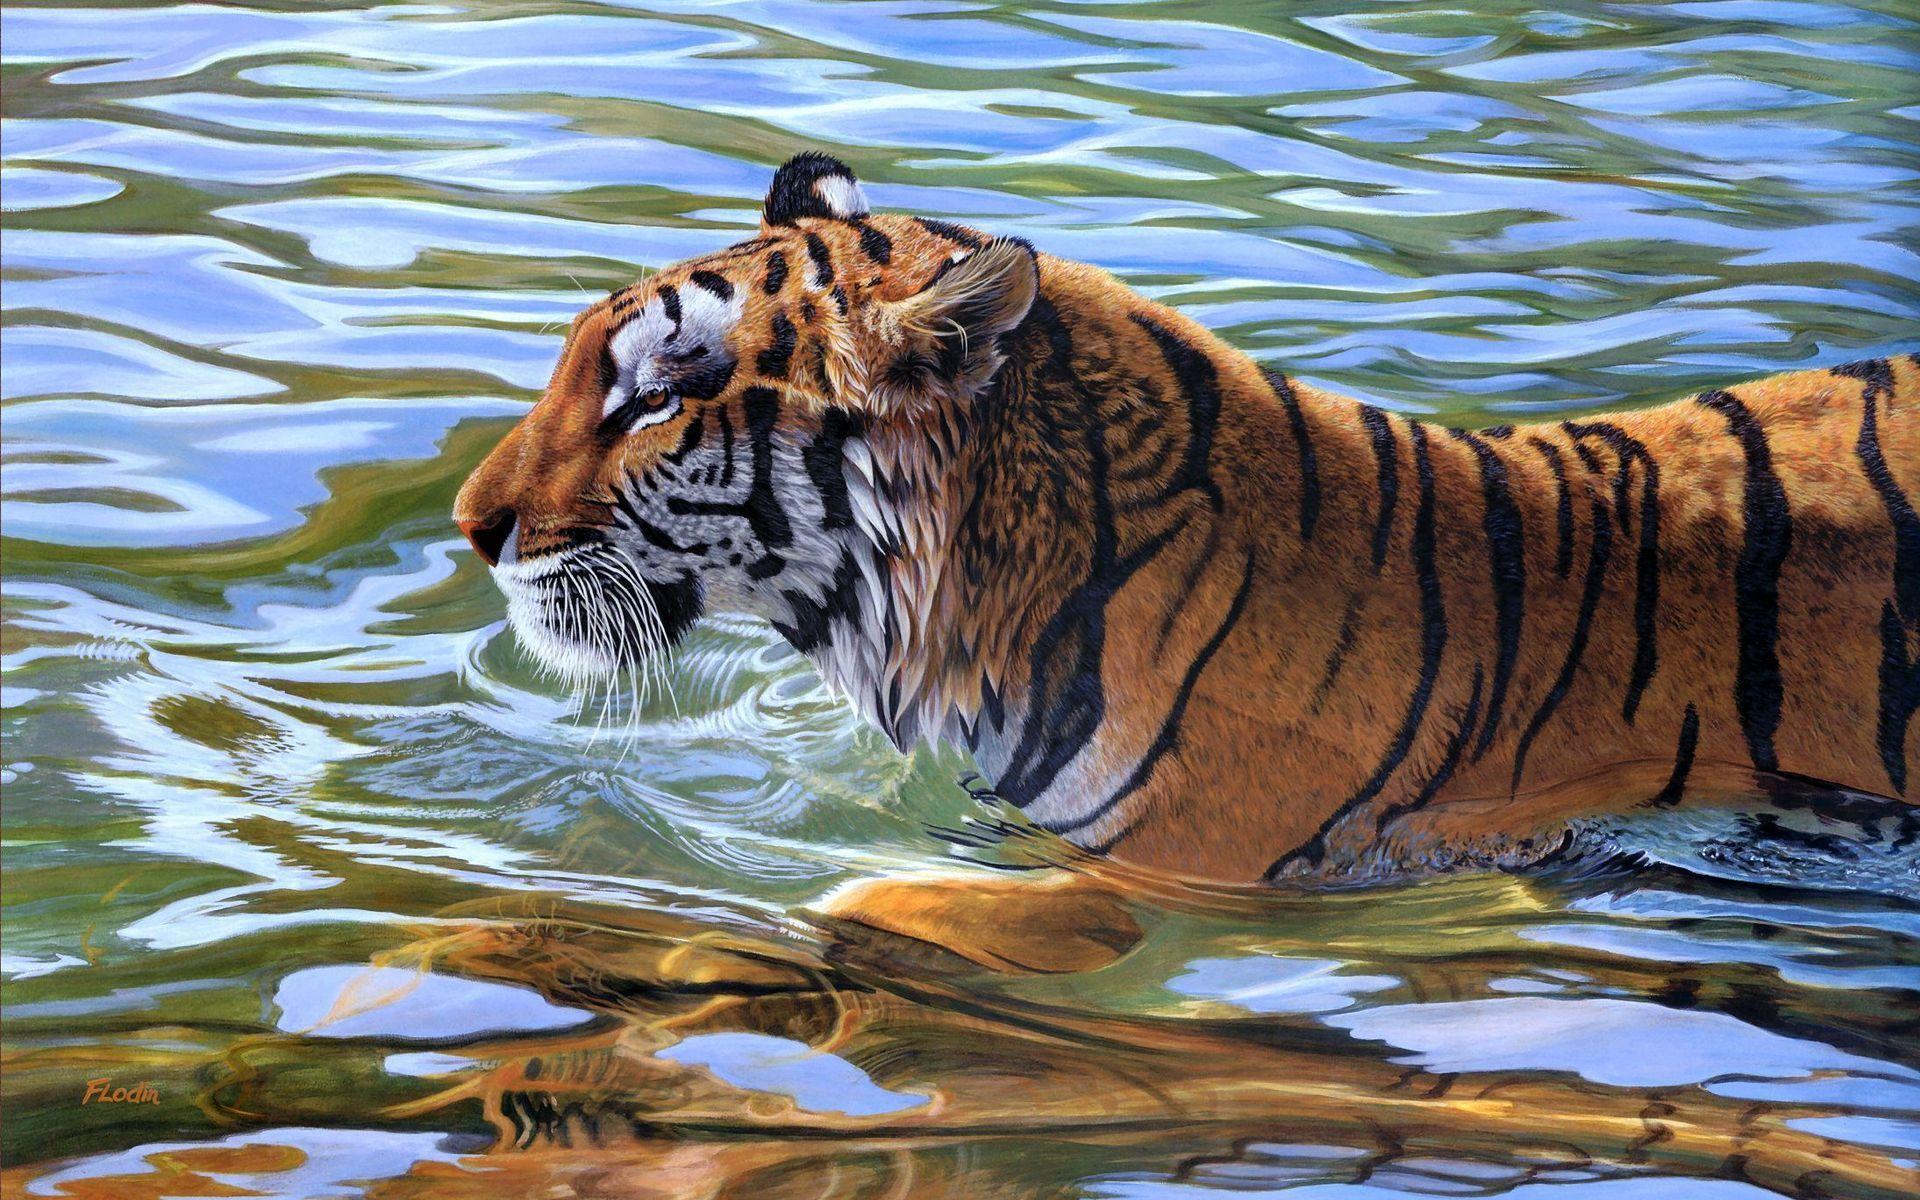 6 Lovely F Tos De Animales Para Fondo De Pantalla En Hd: Animals 1920x1080 Full HD Wallpapers